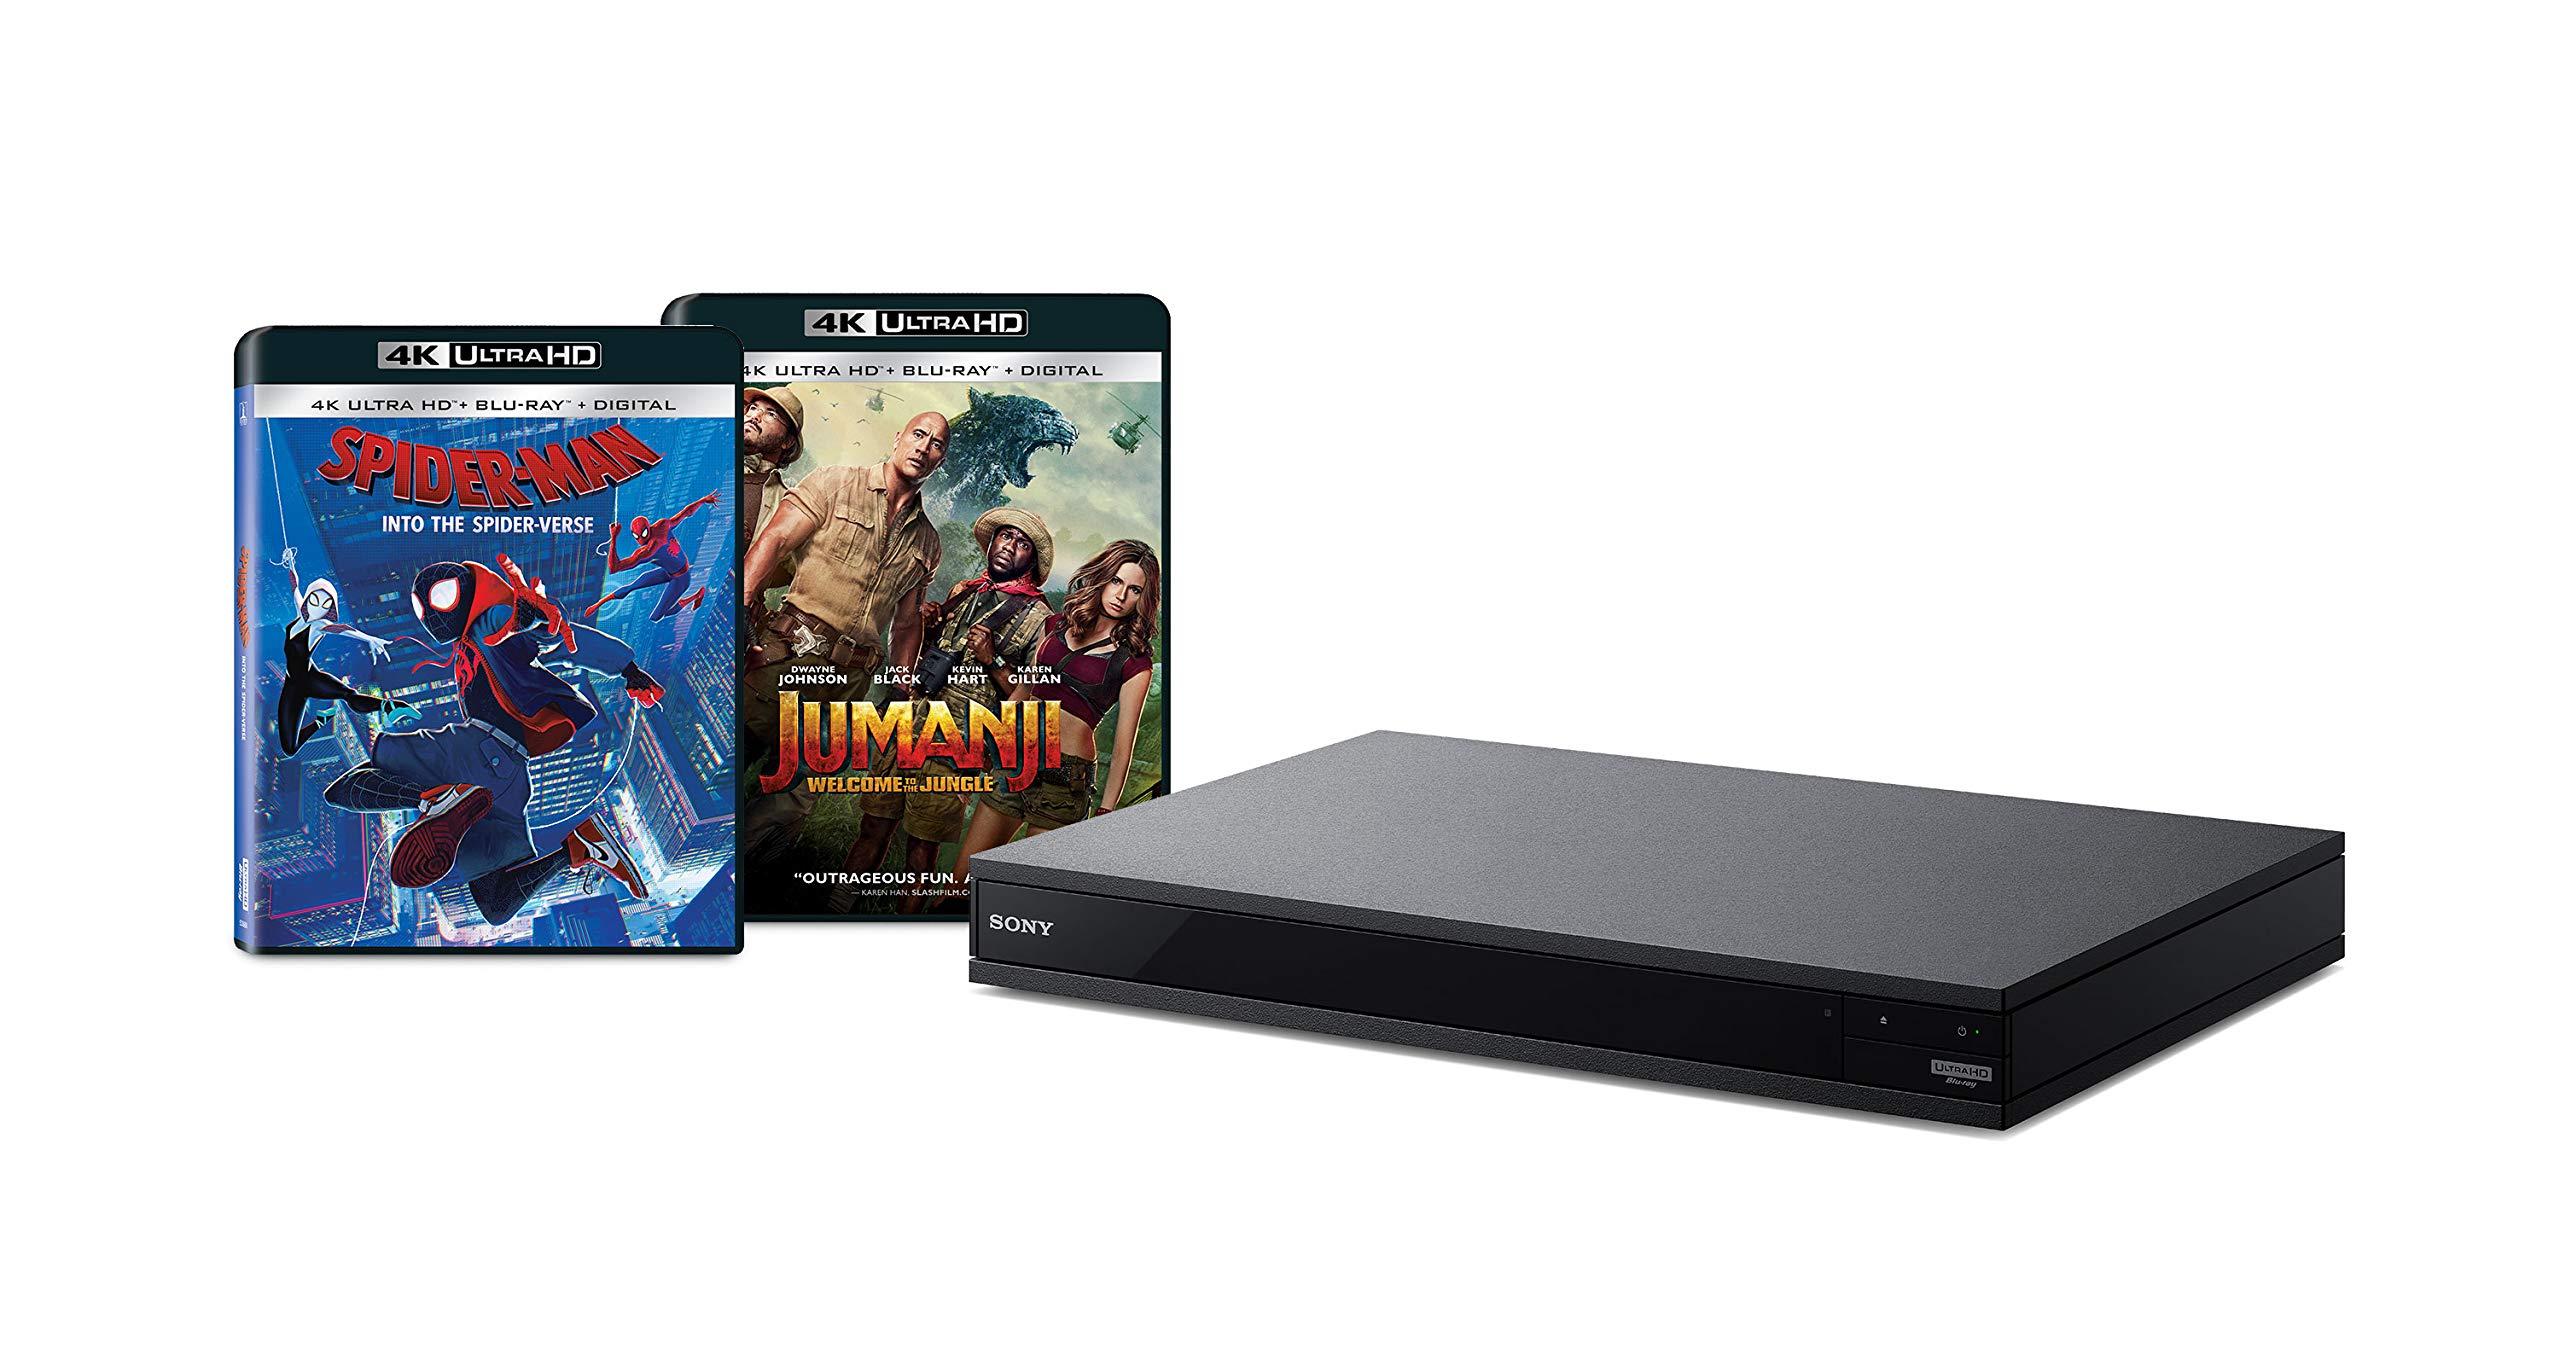 Sony UBP-X800M2 4K UHD Blu-Ray Disc Player with 2 4K Ultra HD Movies